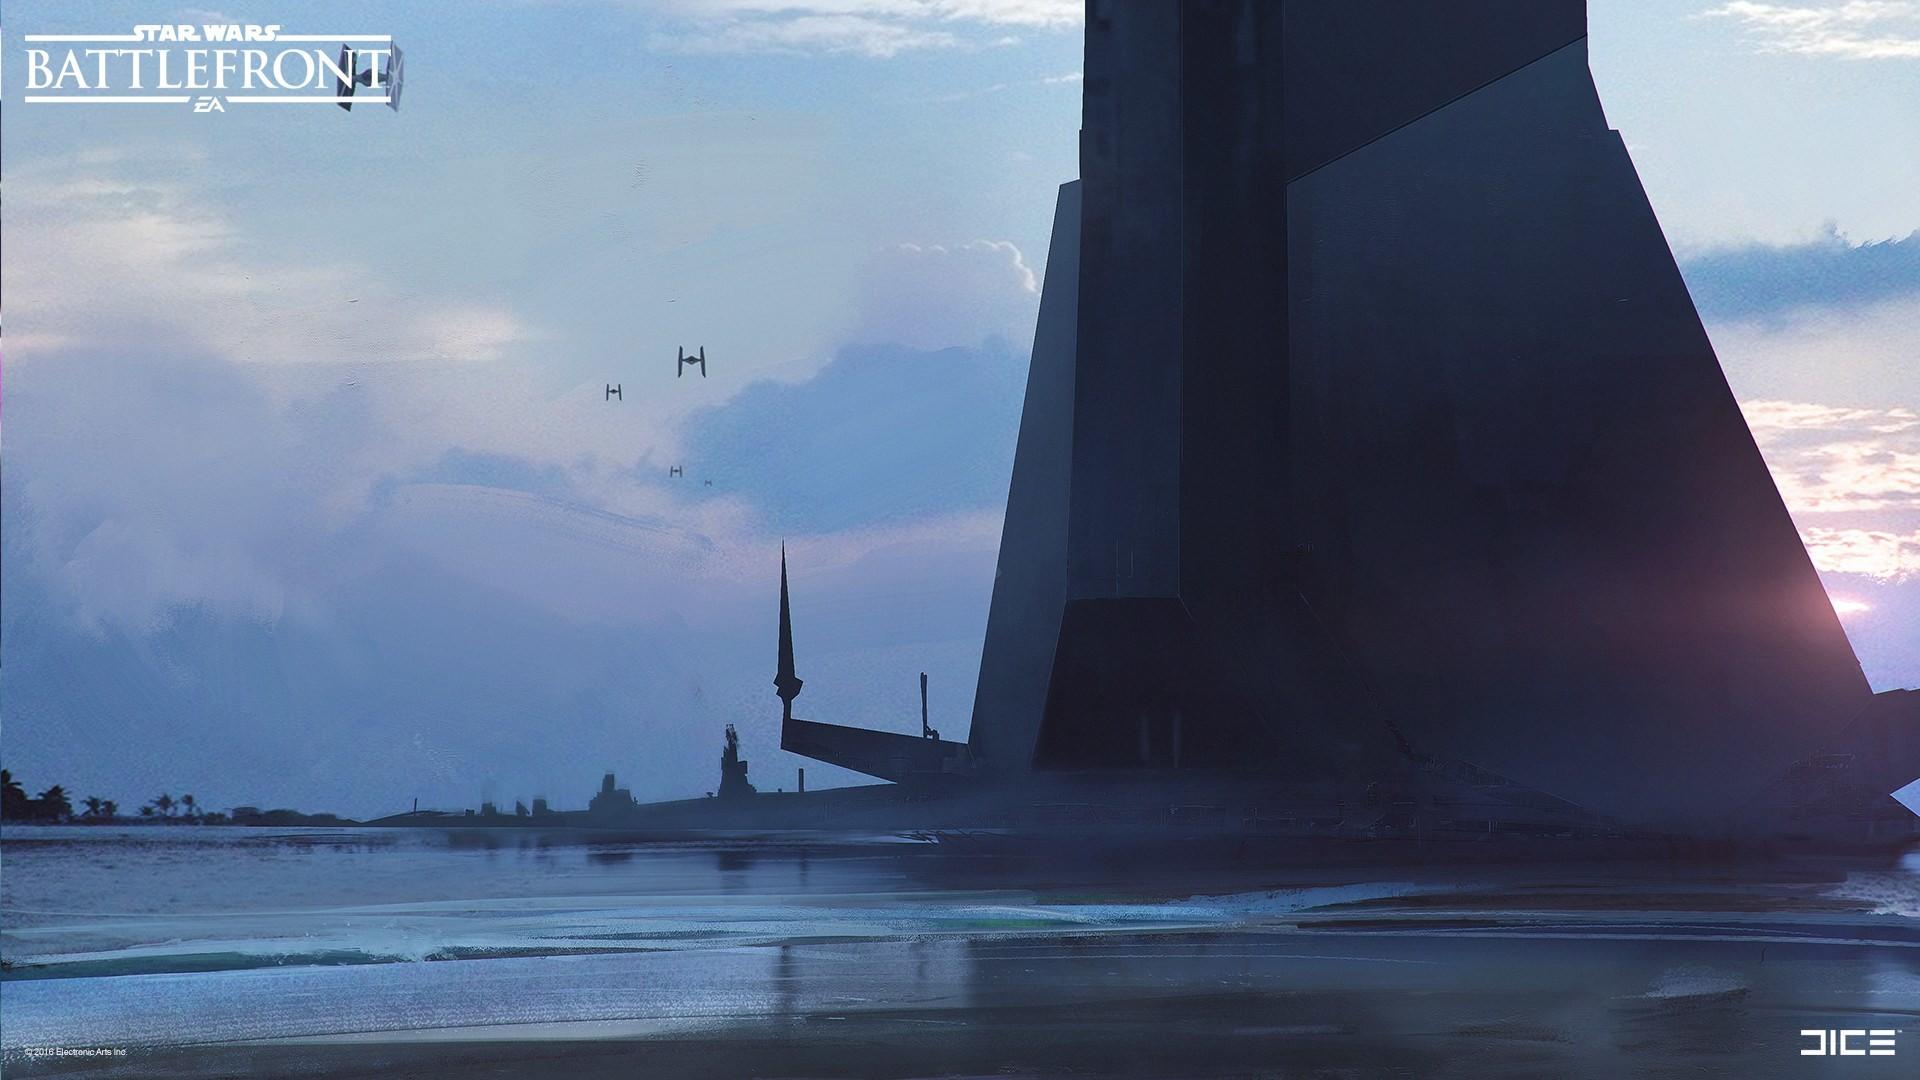 star wars battlefront 2015 backround 1080p high quality by Colt Brian  (2017-03-